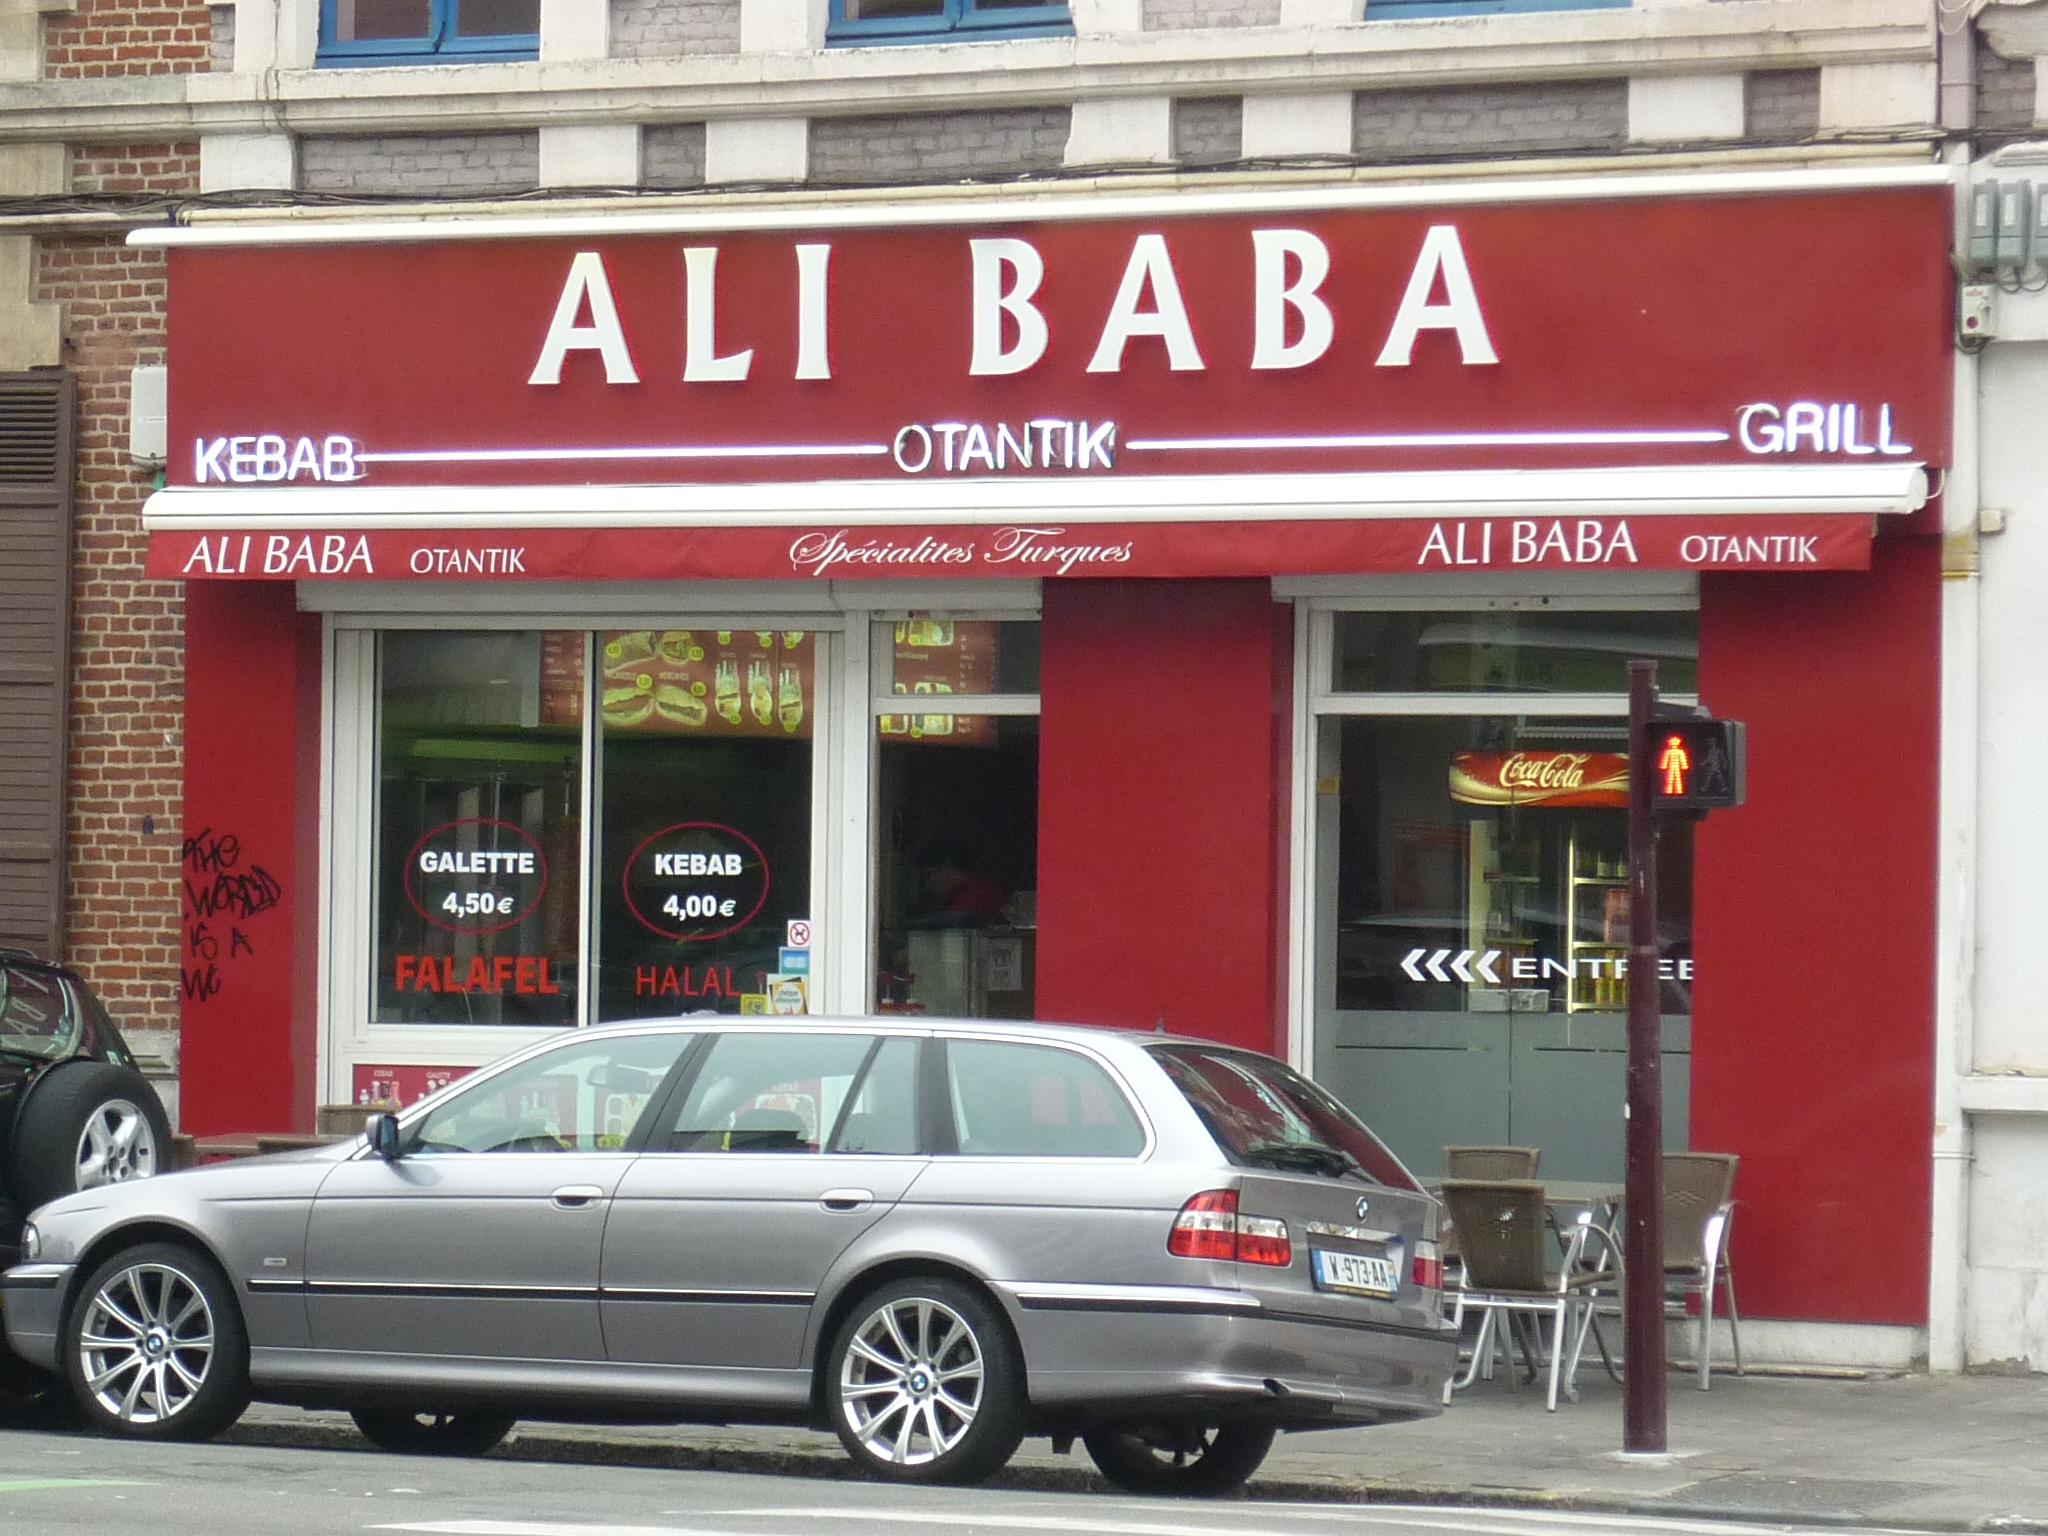 Ali Baba Otantik - Lille